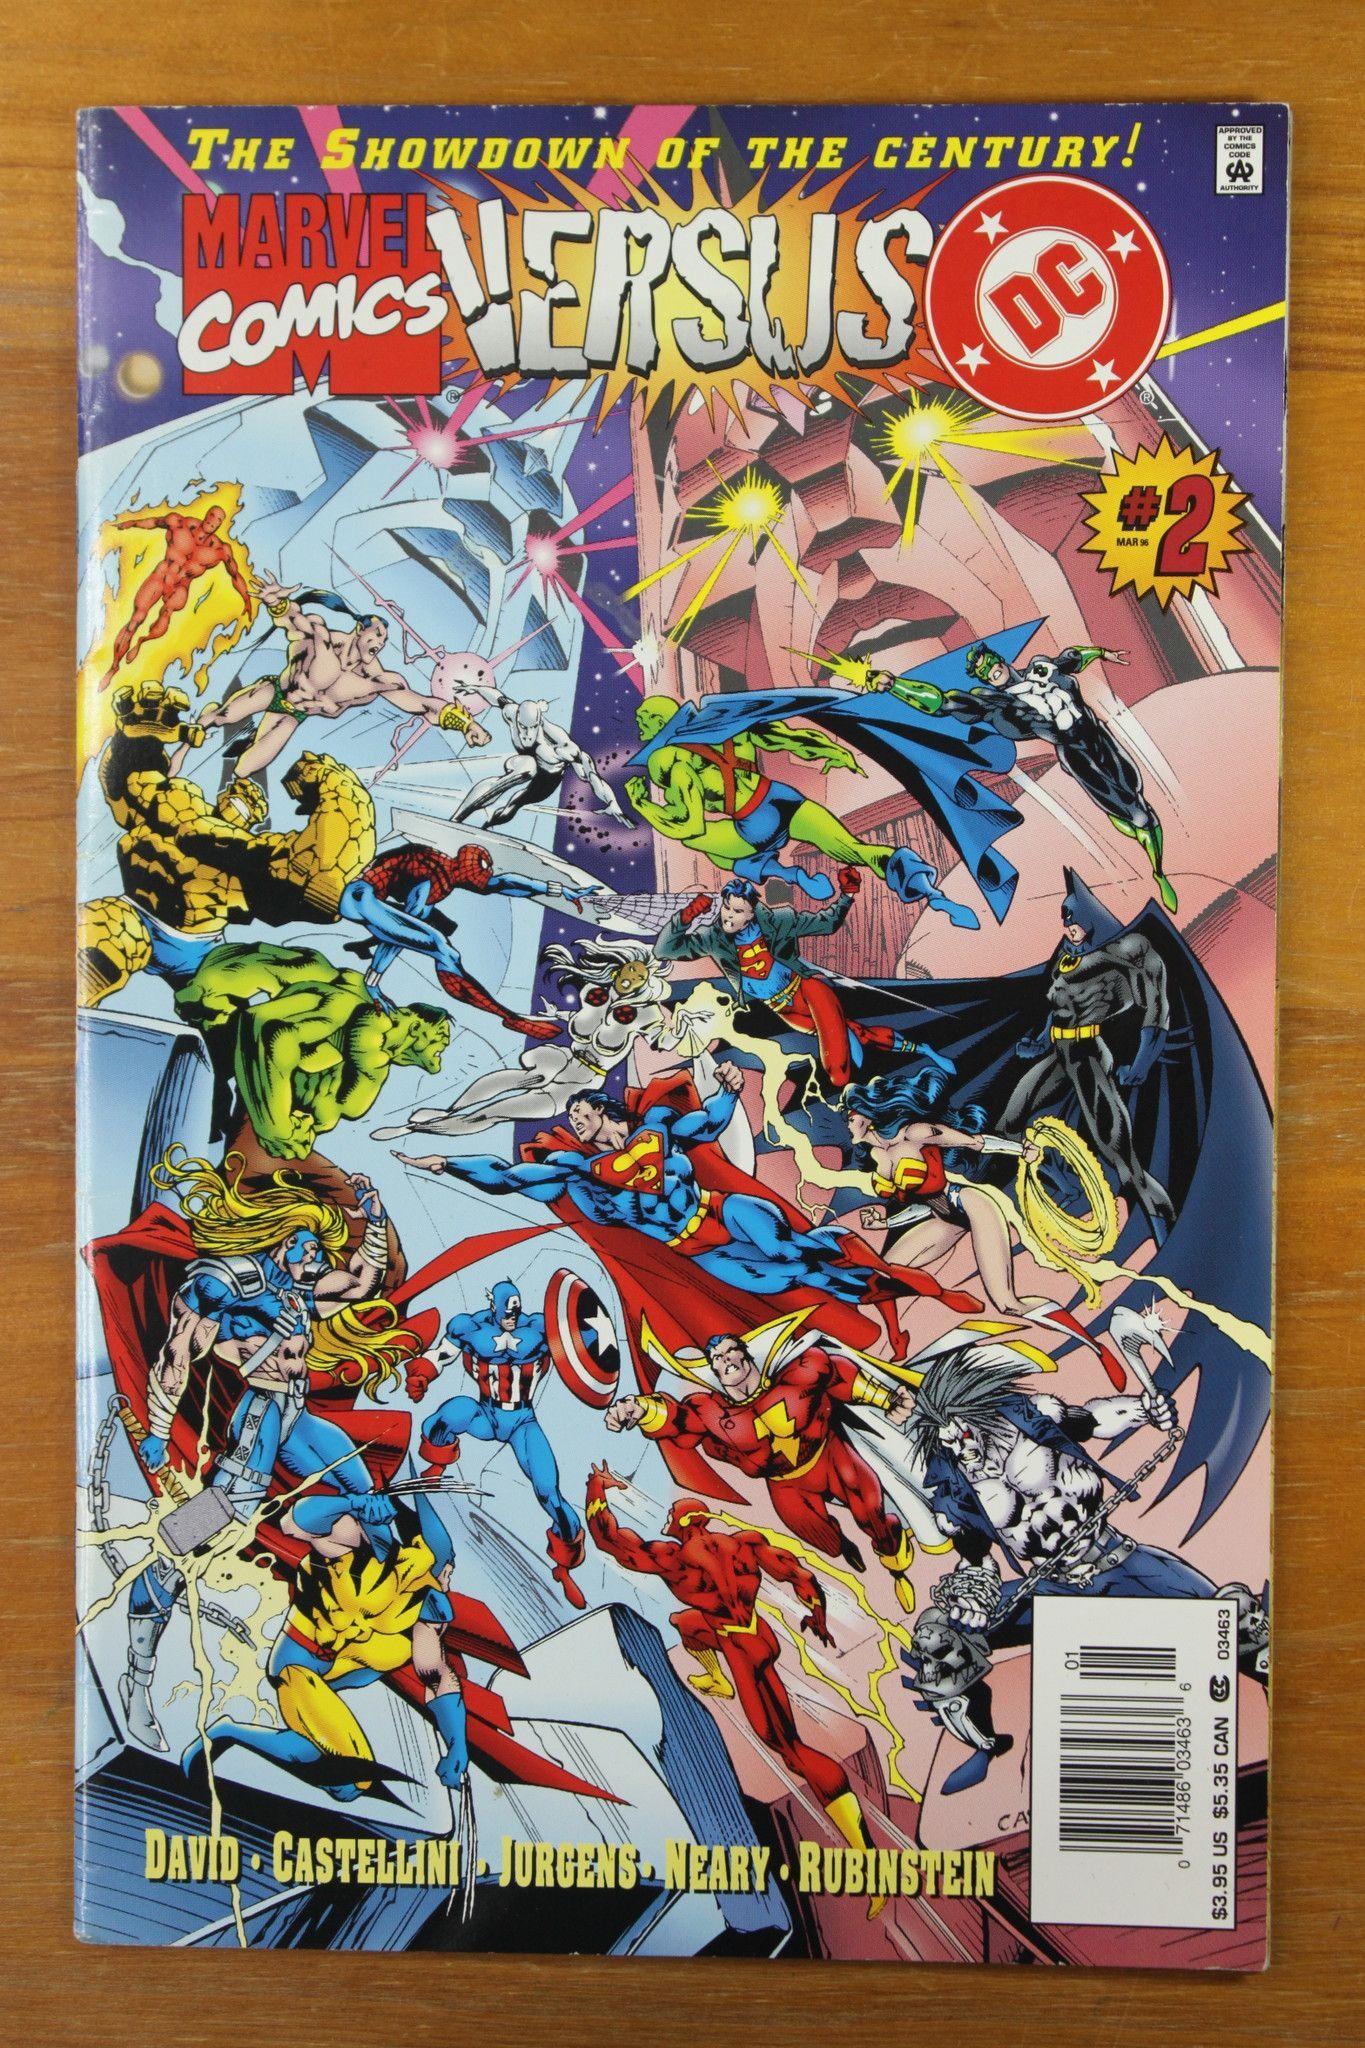 DC Versus Marvel Vol 1 # 1-4 Plus Green Lantern and Silver Surfer Vol 1 # 1